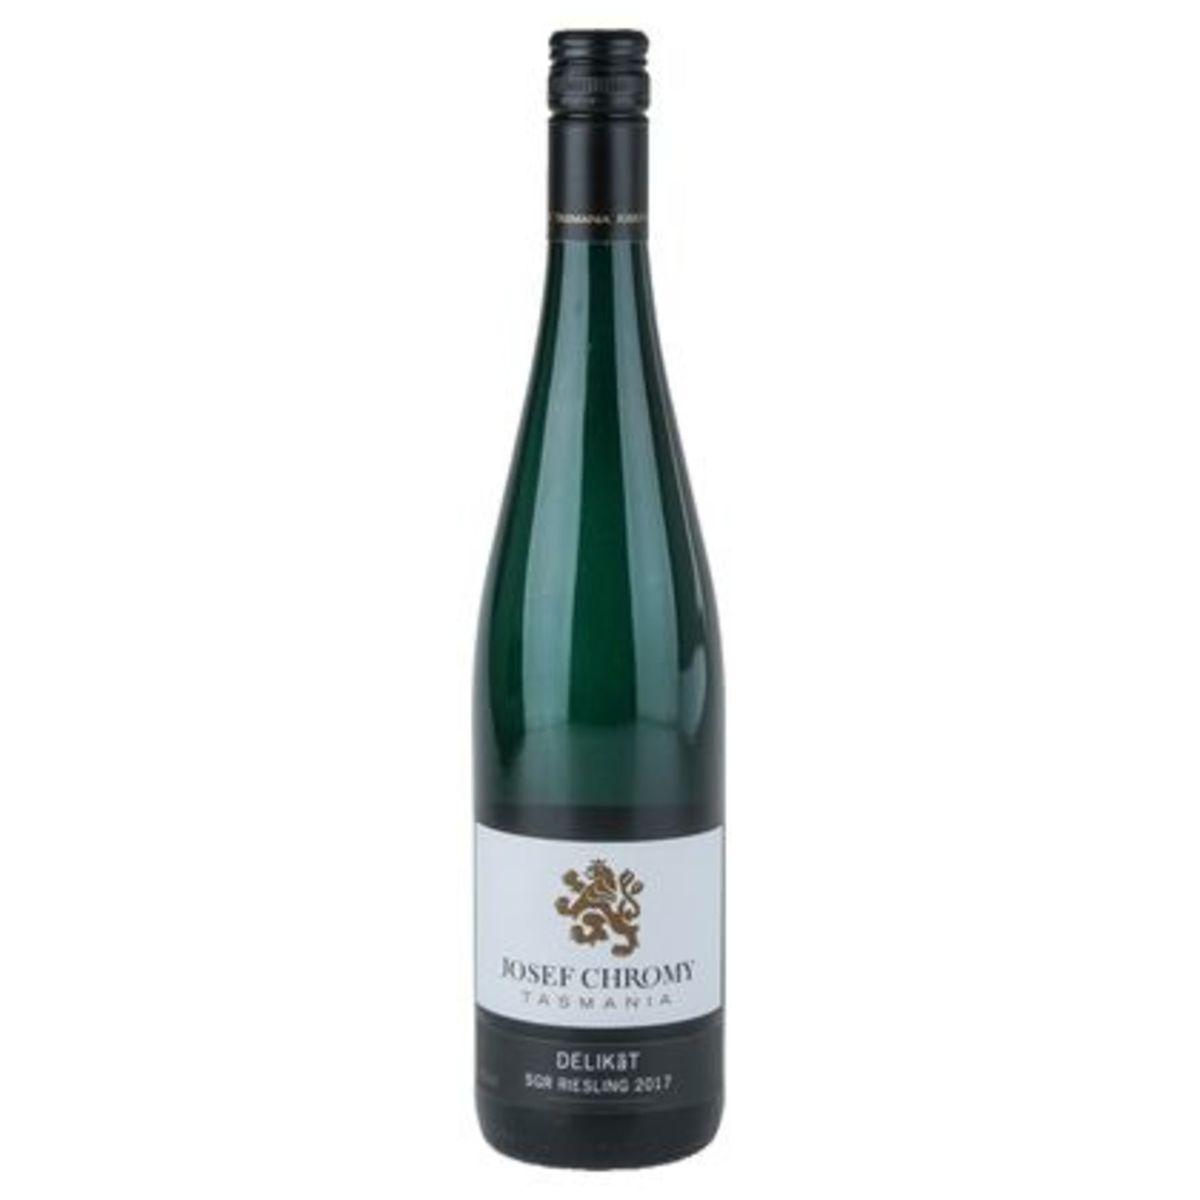 Josef Chromy Delikat SGR Riesling Blanc